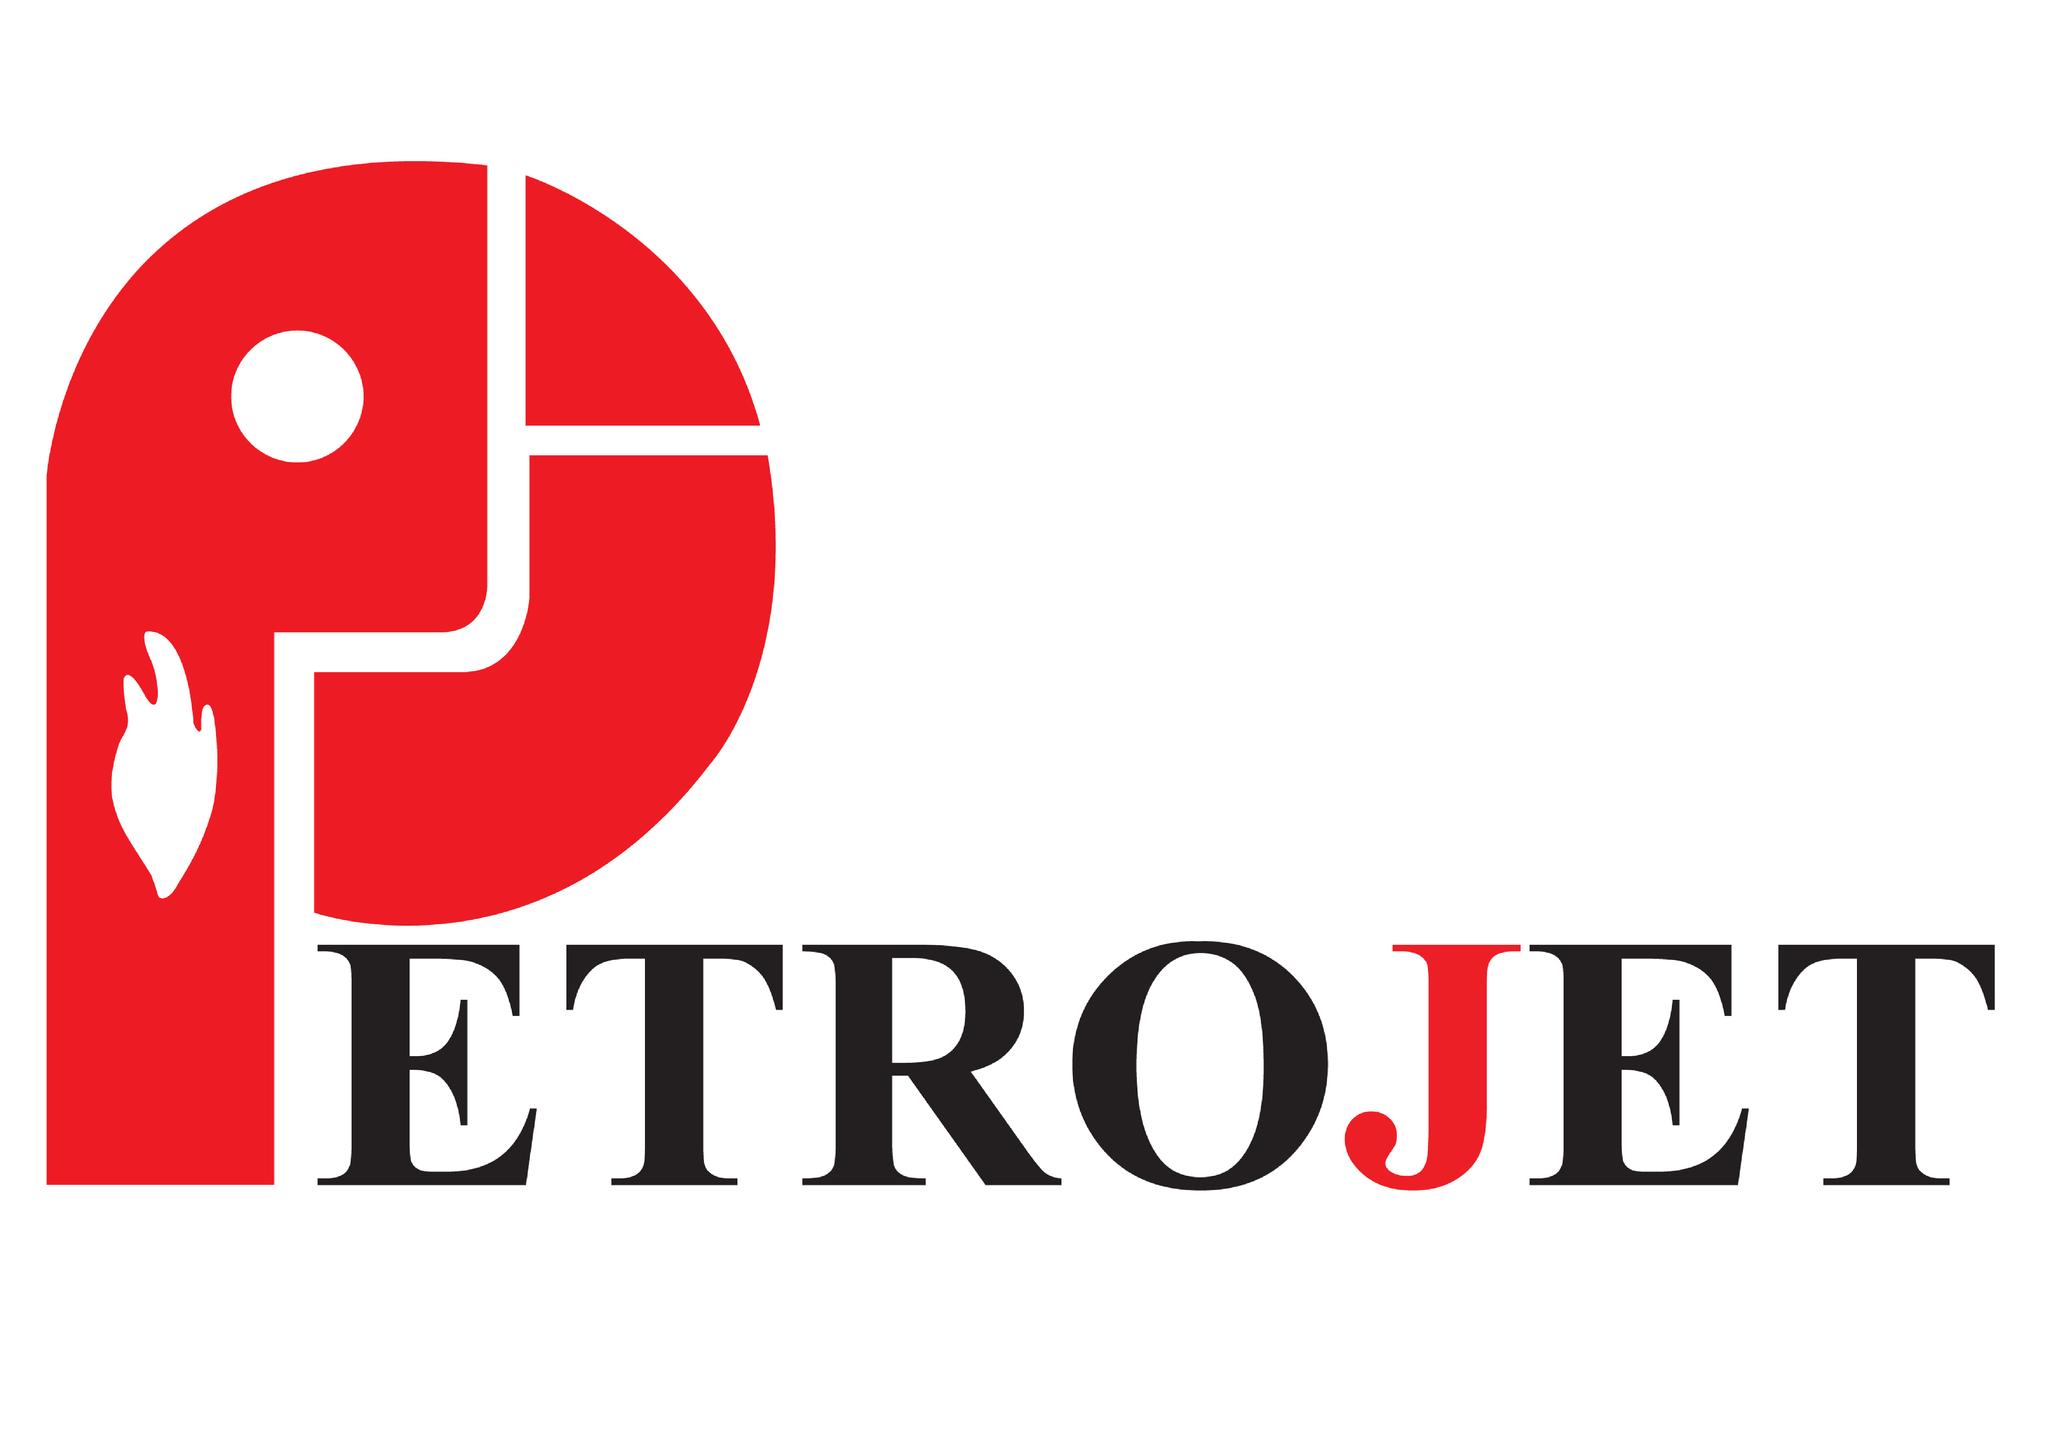 PETROJET COMPANY